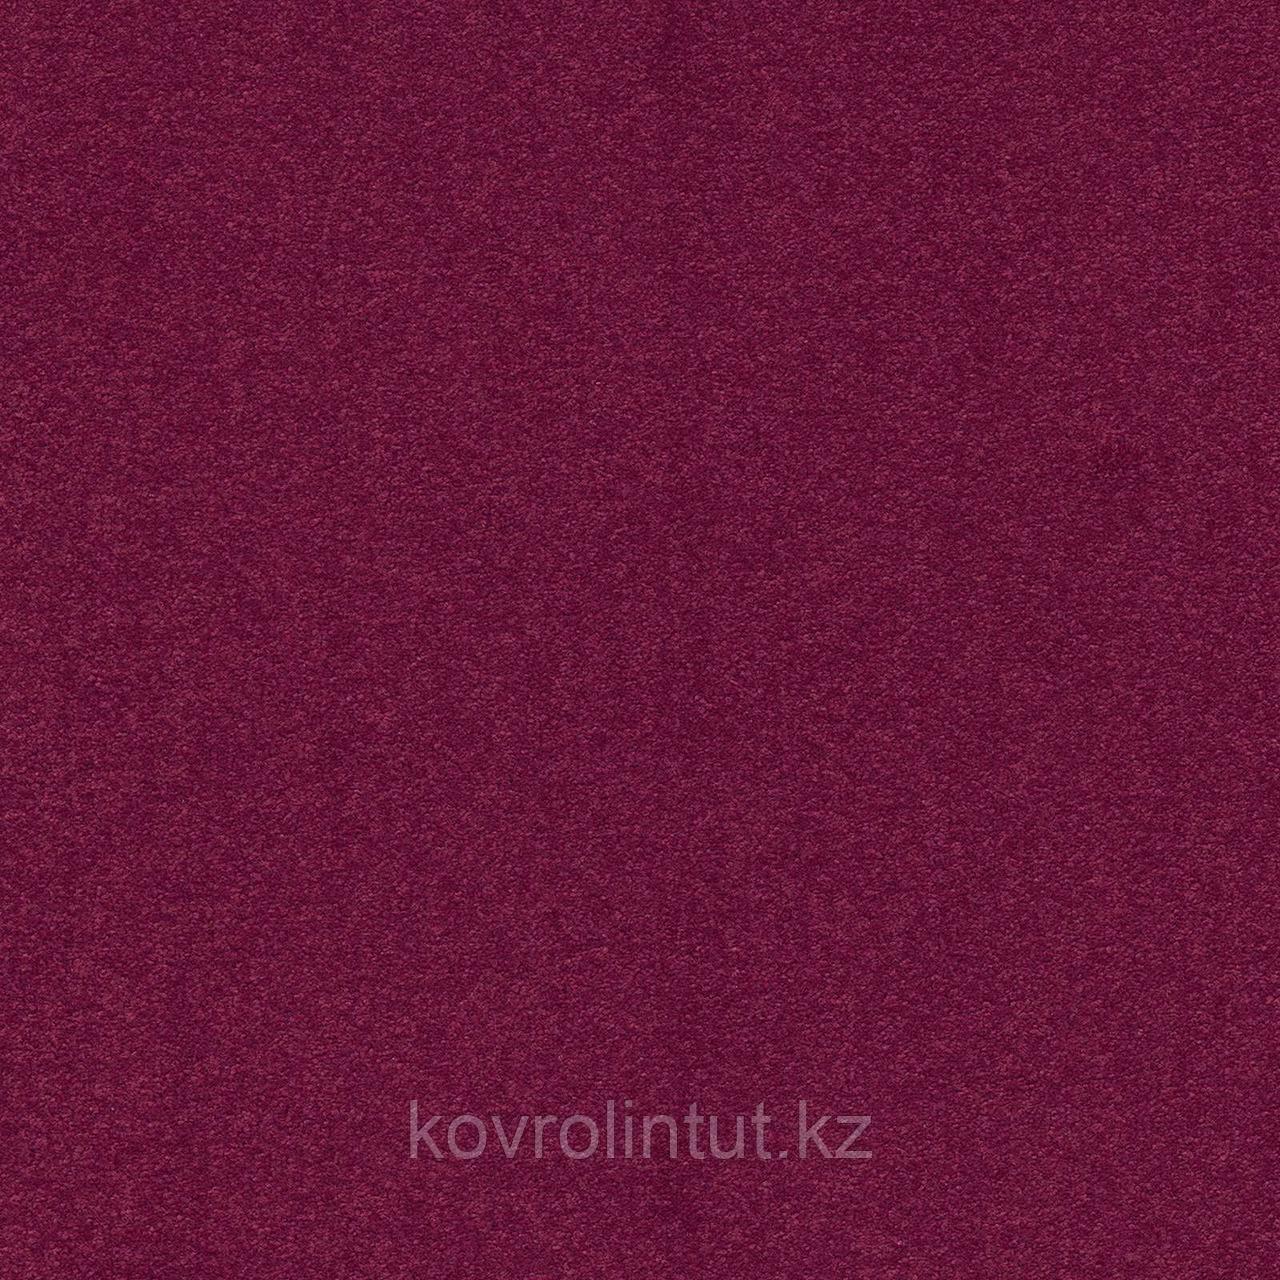 Плитка ковровая Modulyss Cambridge 314, 100% PA